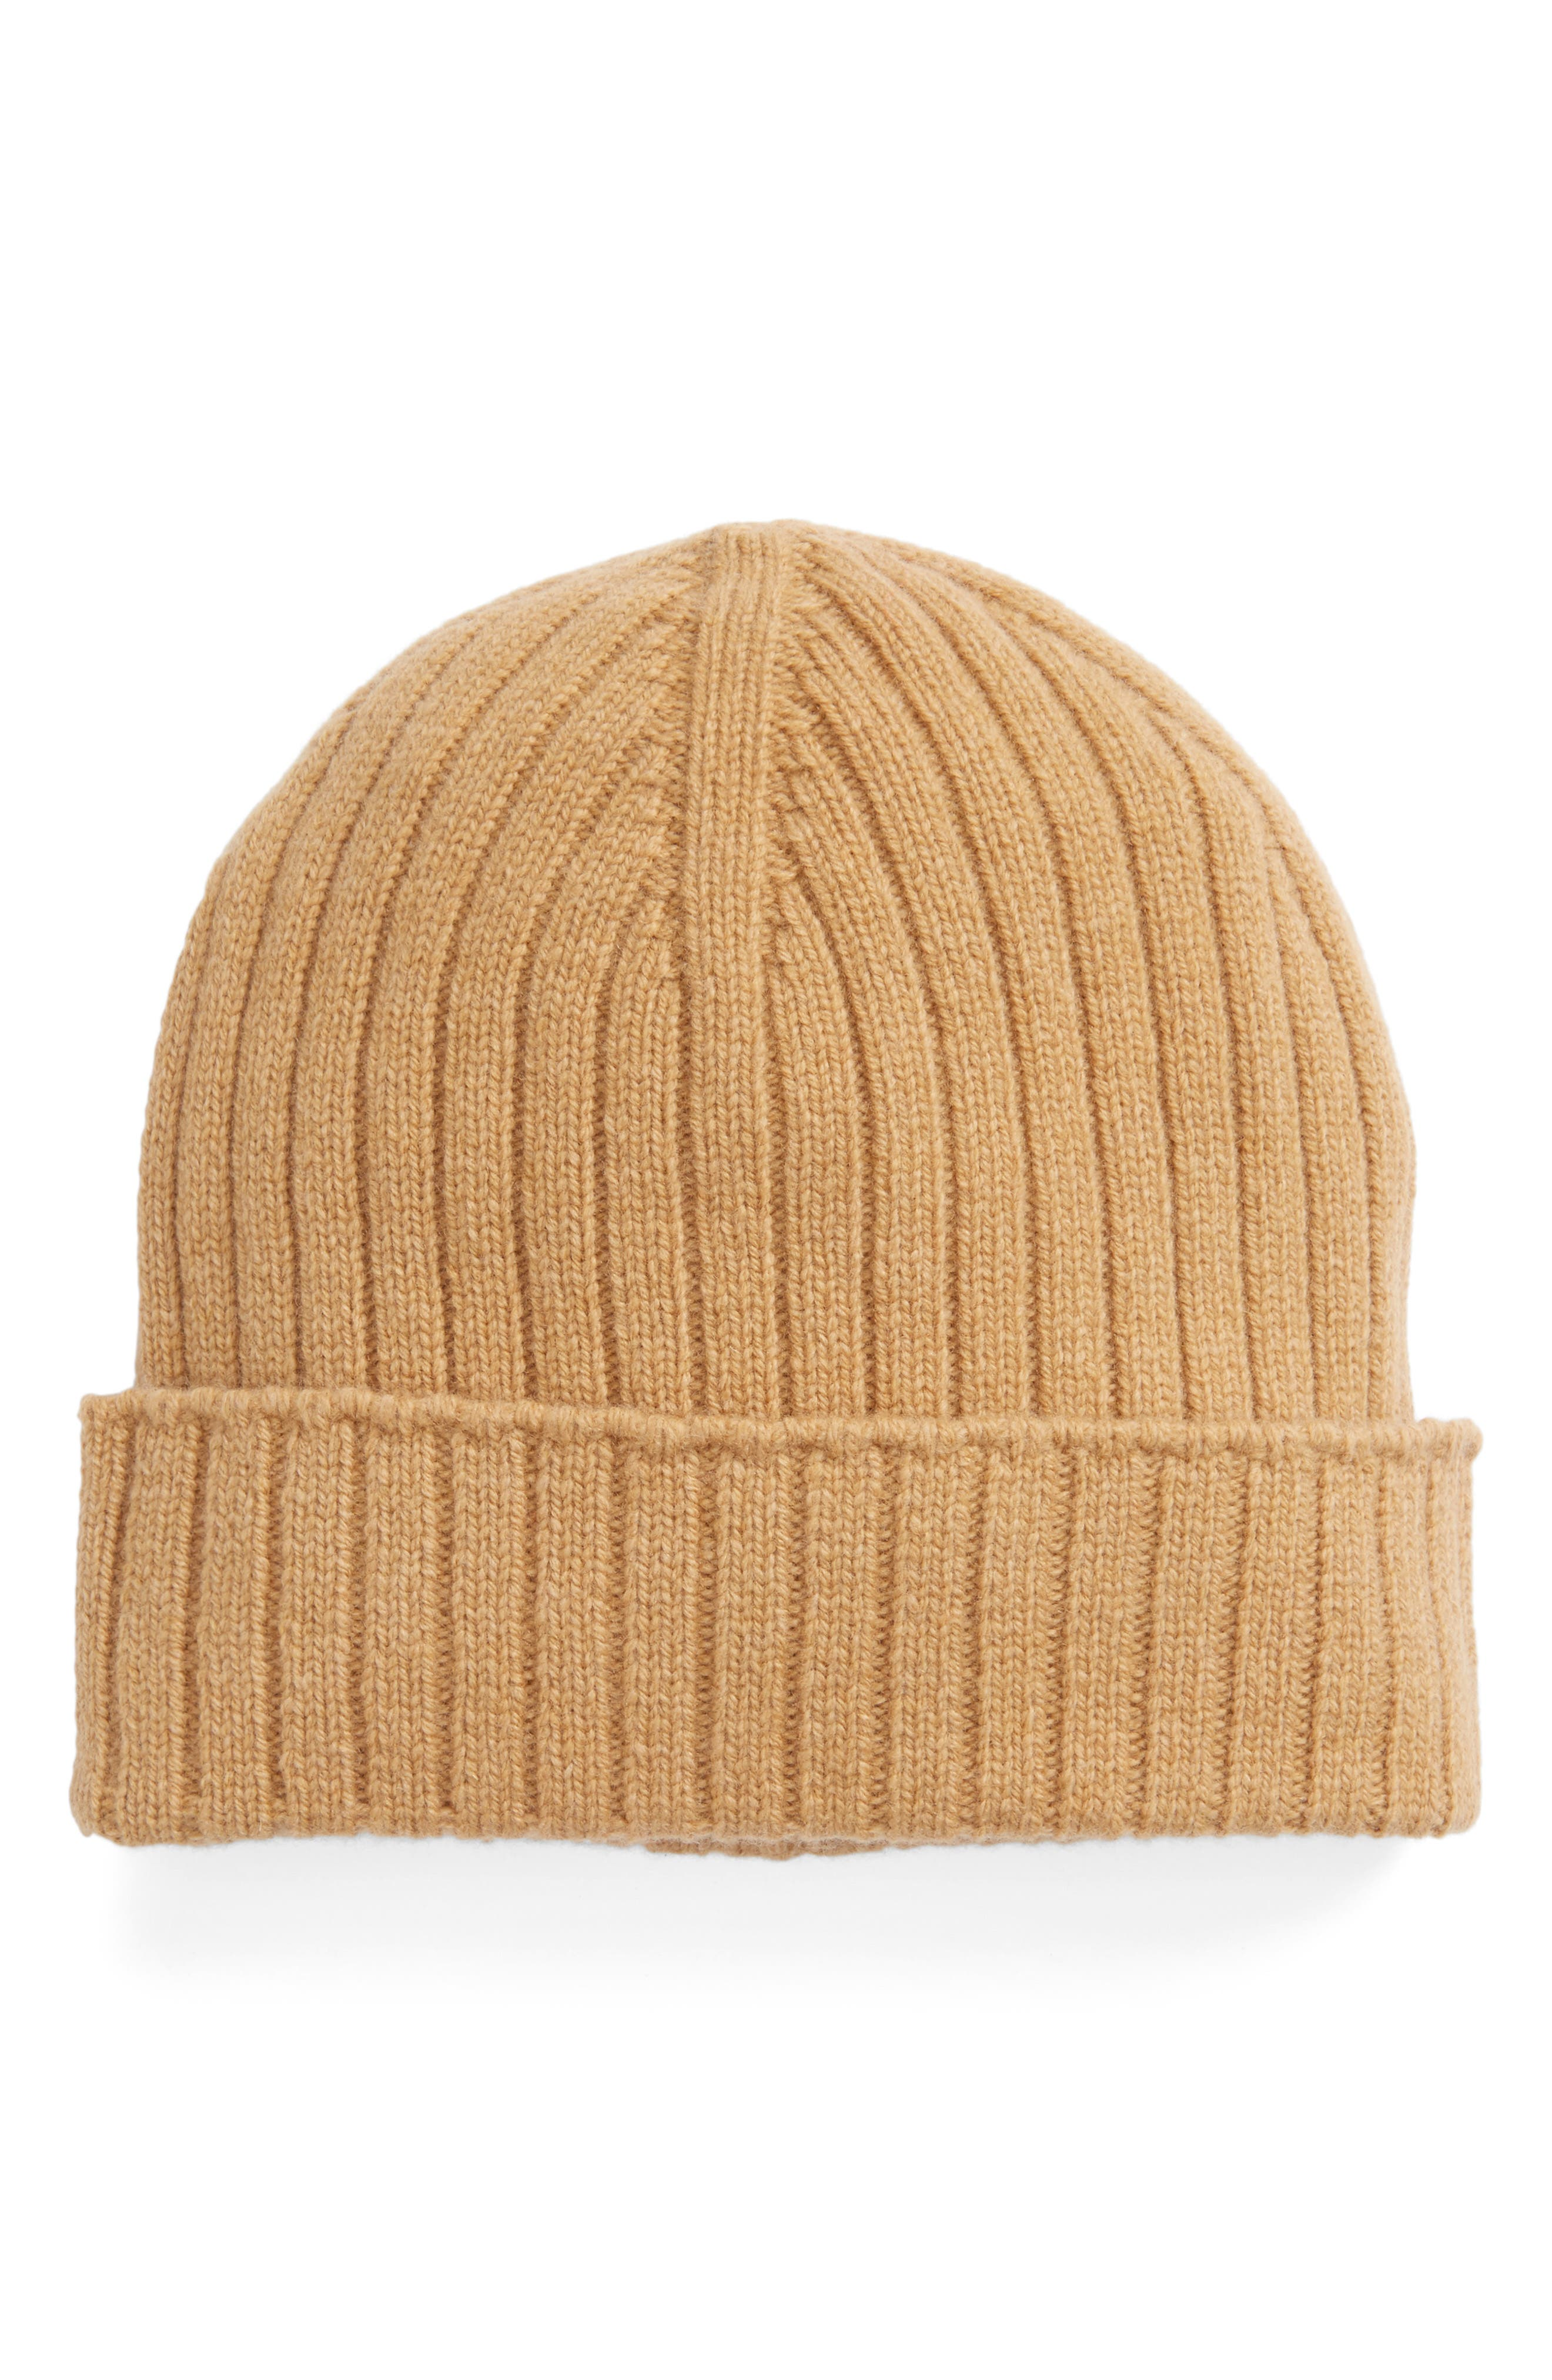 A.P.C. Wool Knit Cap